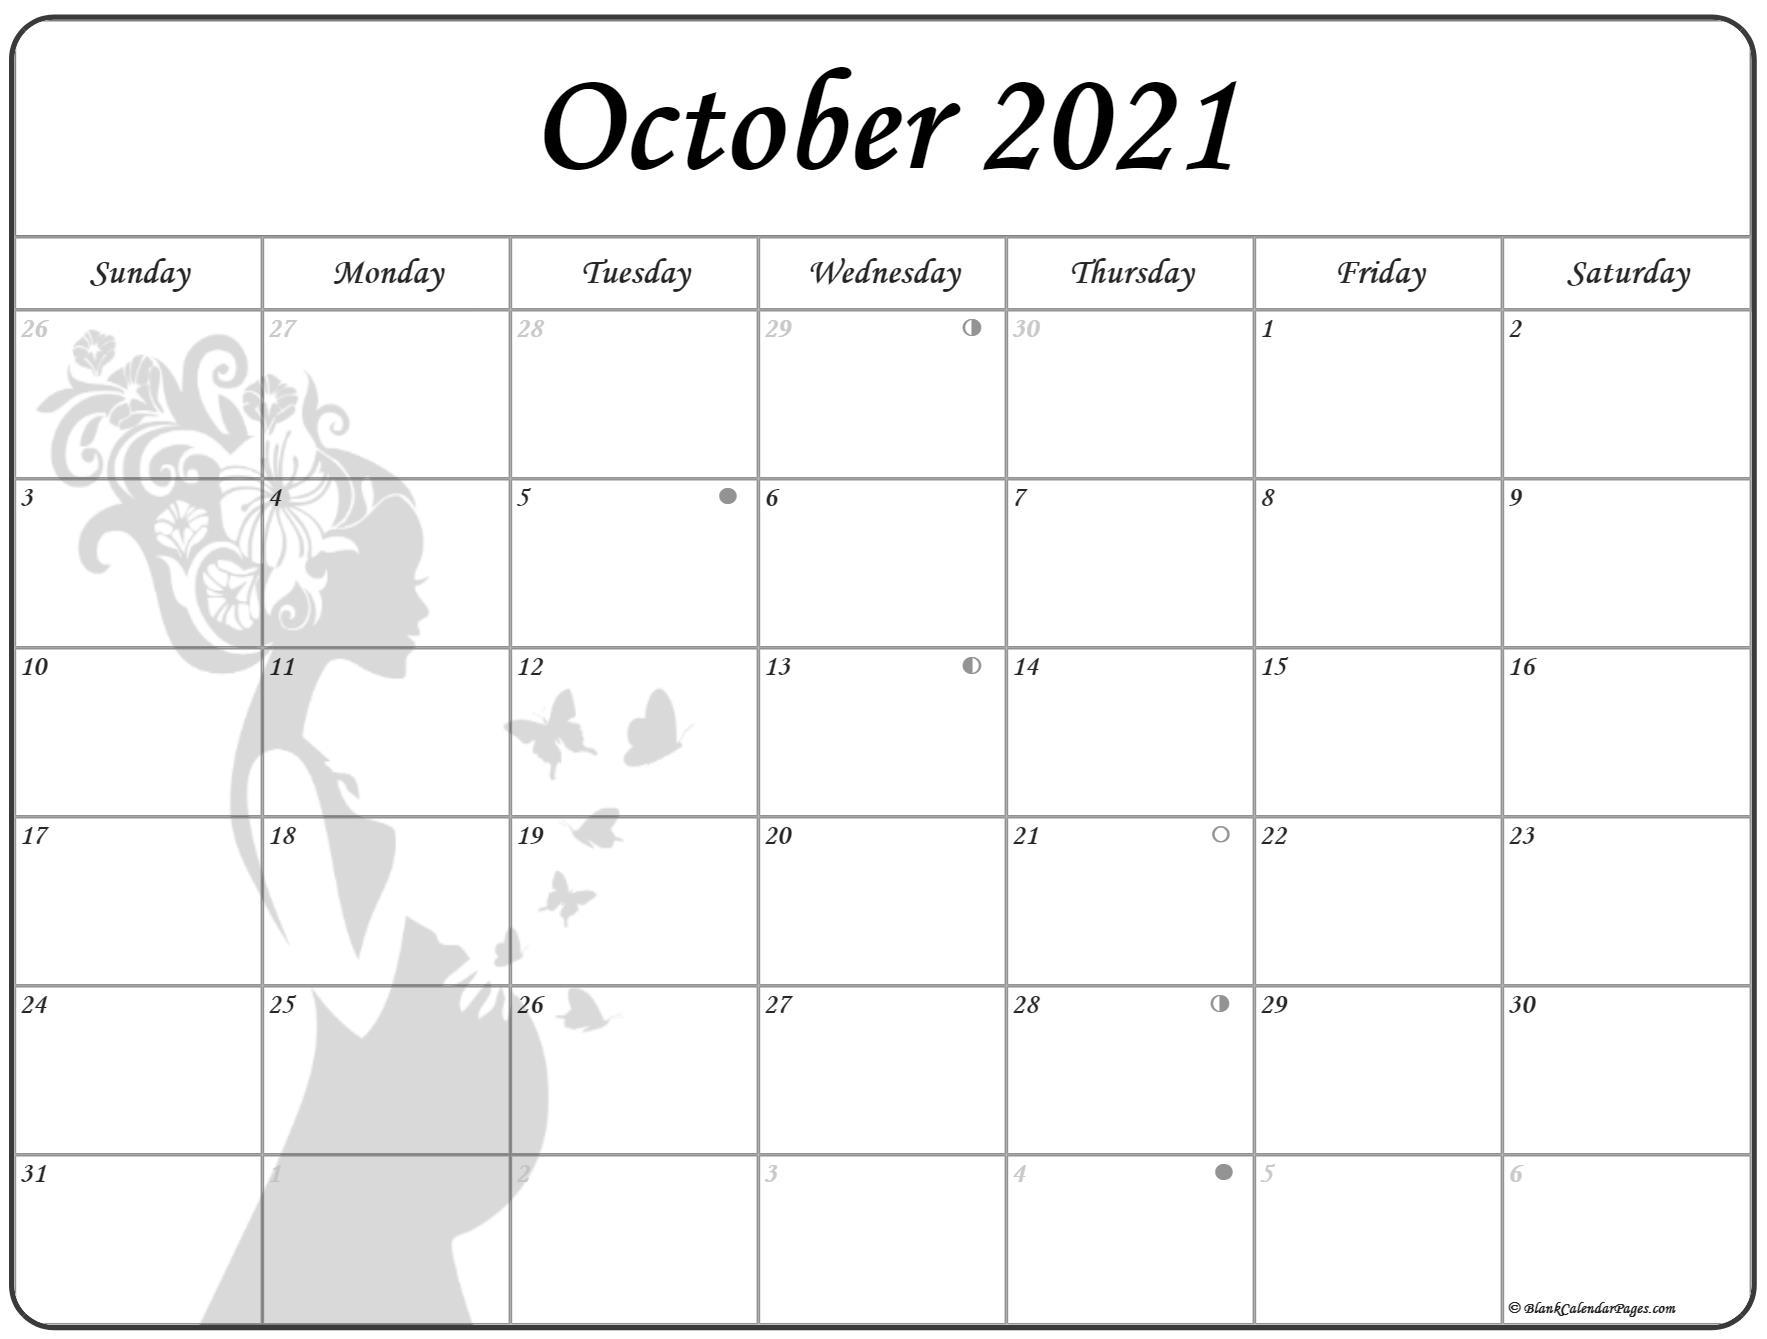 October 2021 Pregnancy Calendar   Fertility Calendar